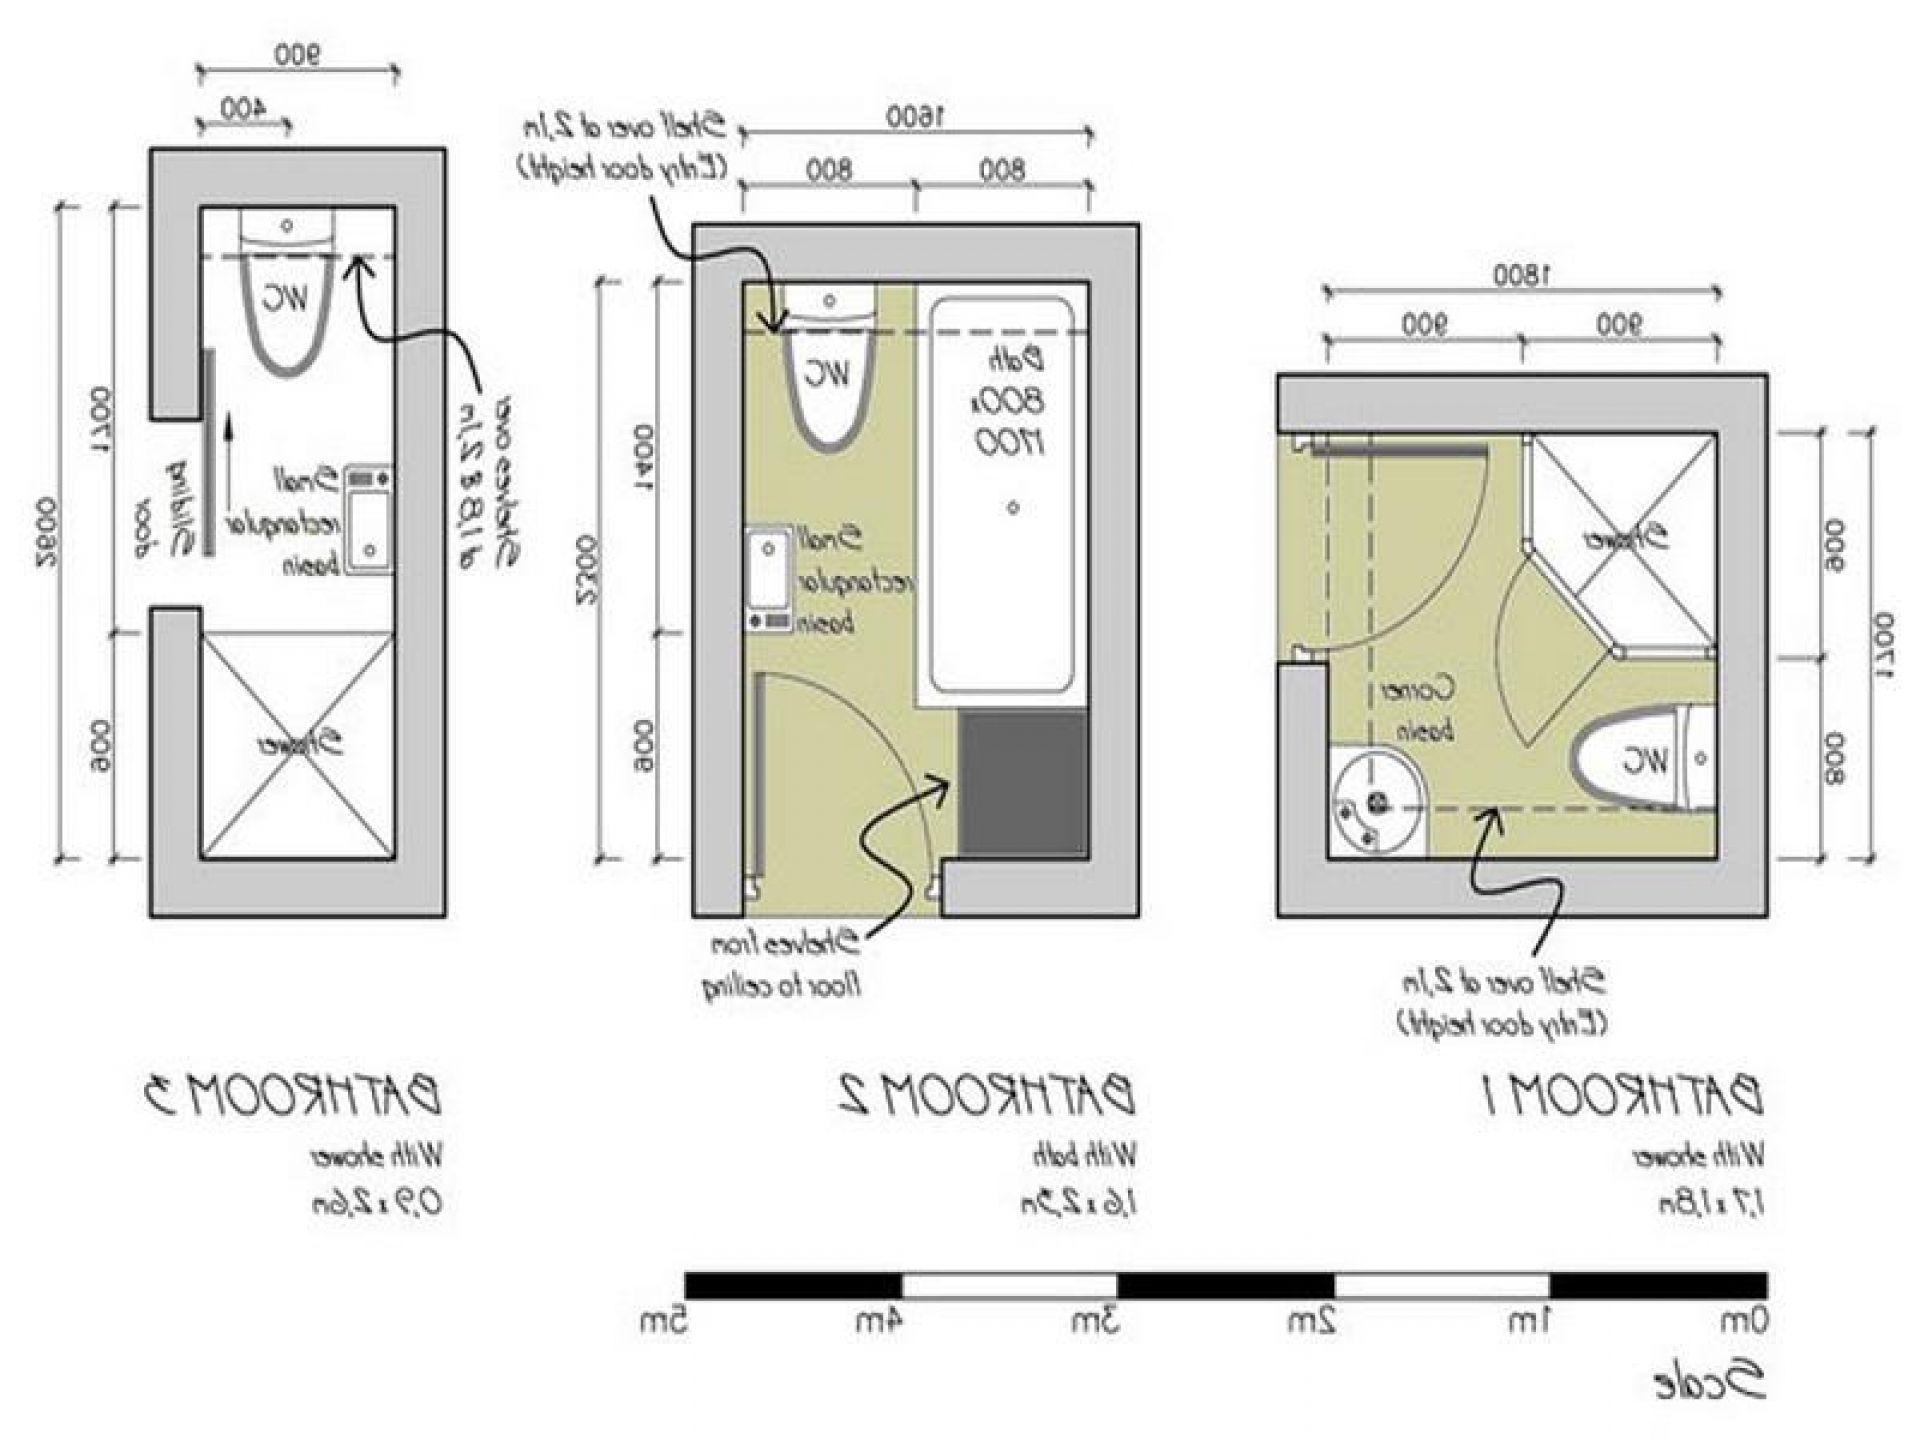 Small Bathroom Ideas Floor Plans  Httpviajesairmar New Small Bathroom Designs And Floor Plans Design Decoration